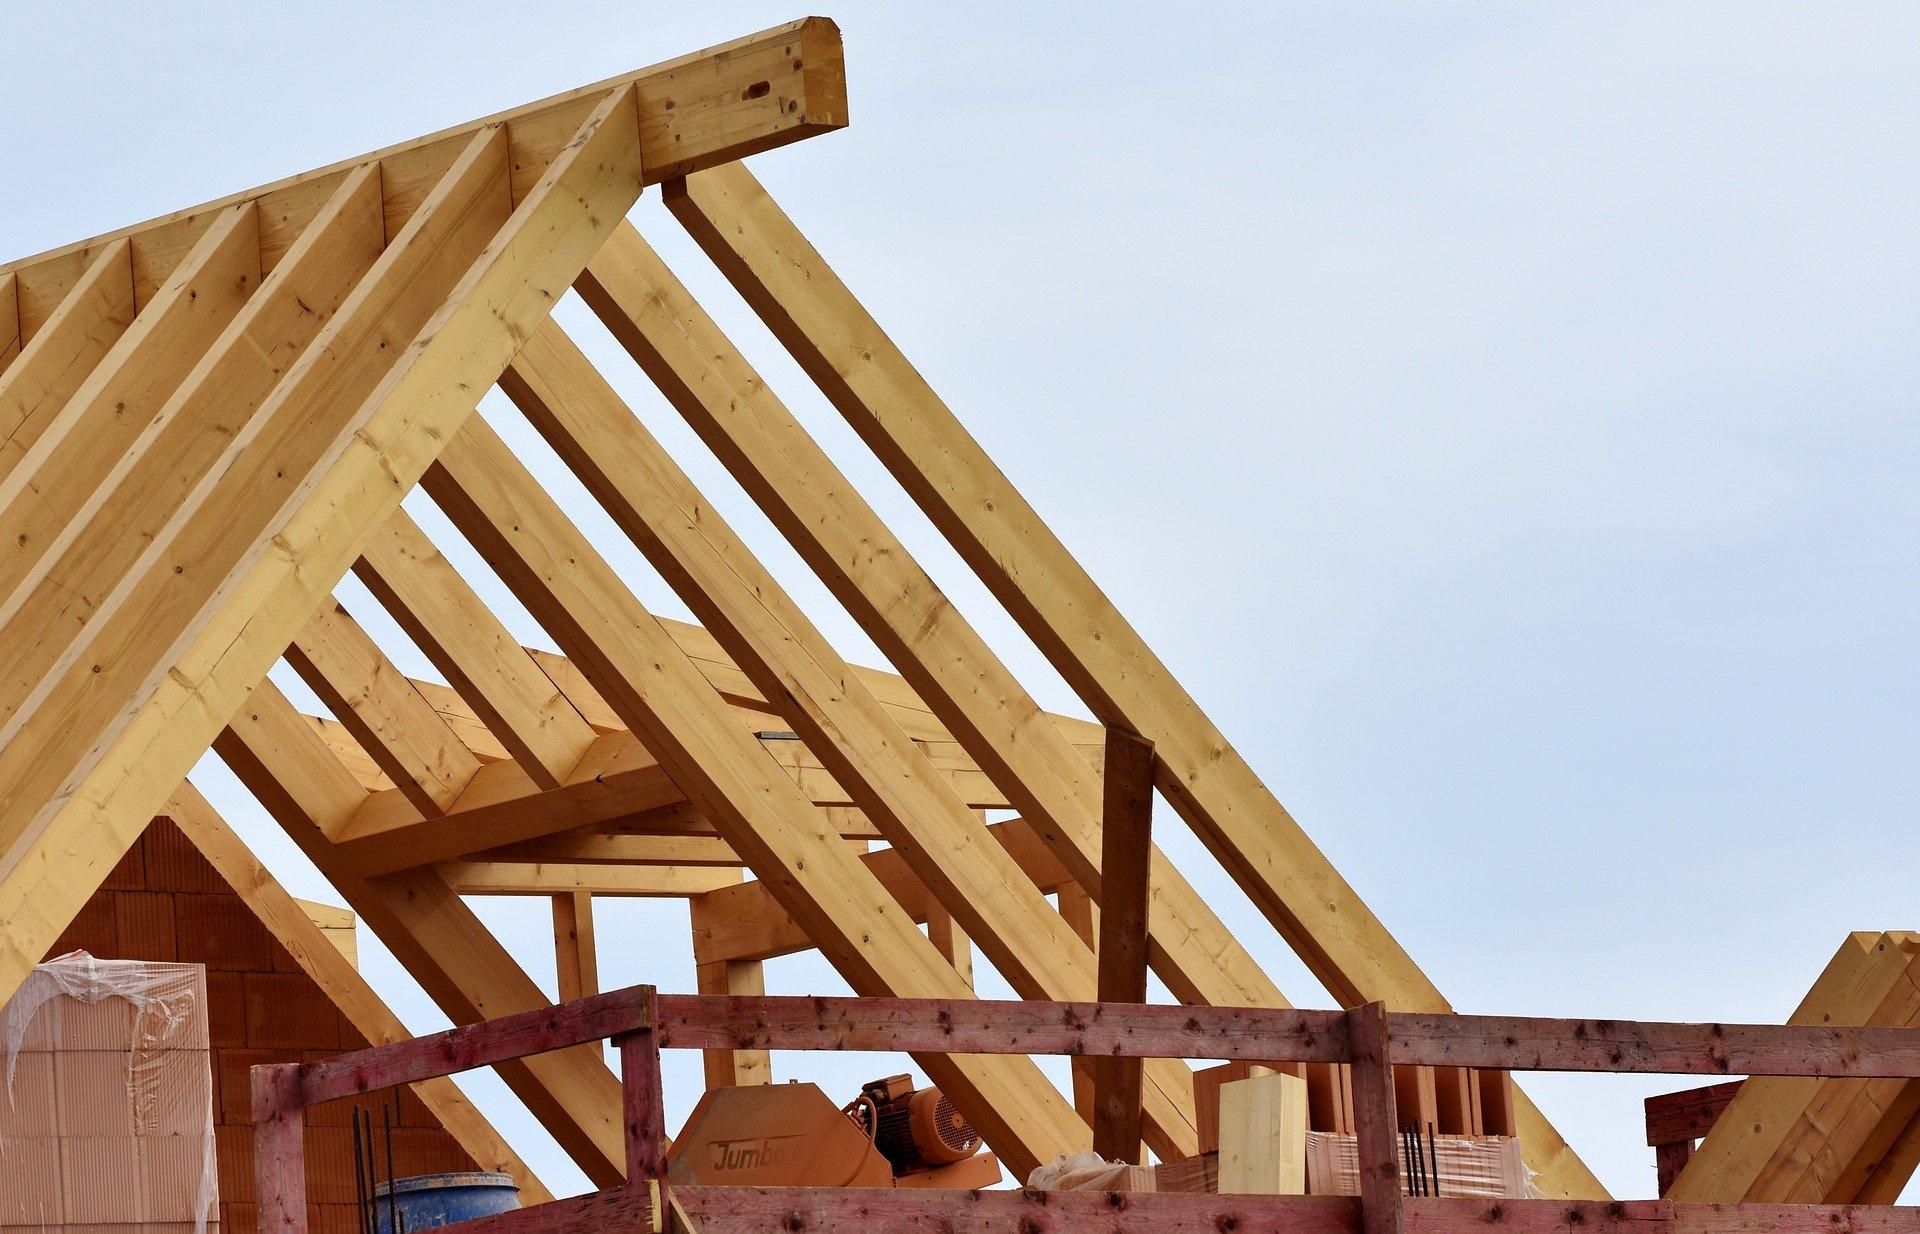 roof-truss-3339206_1920 (1)